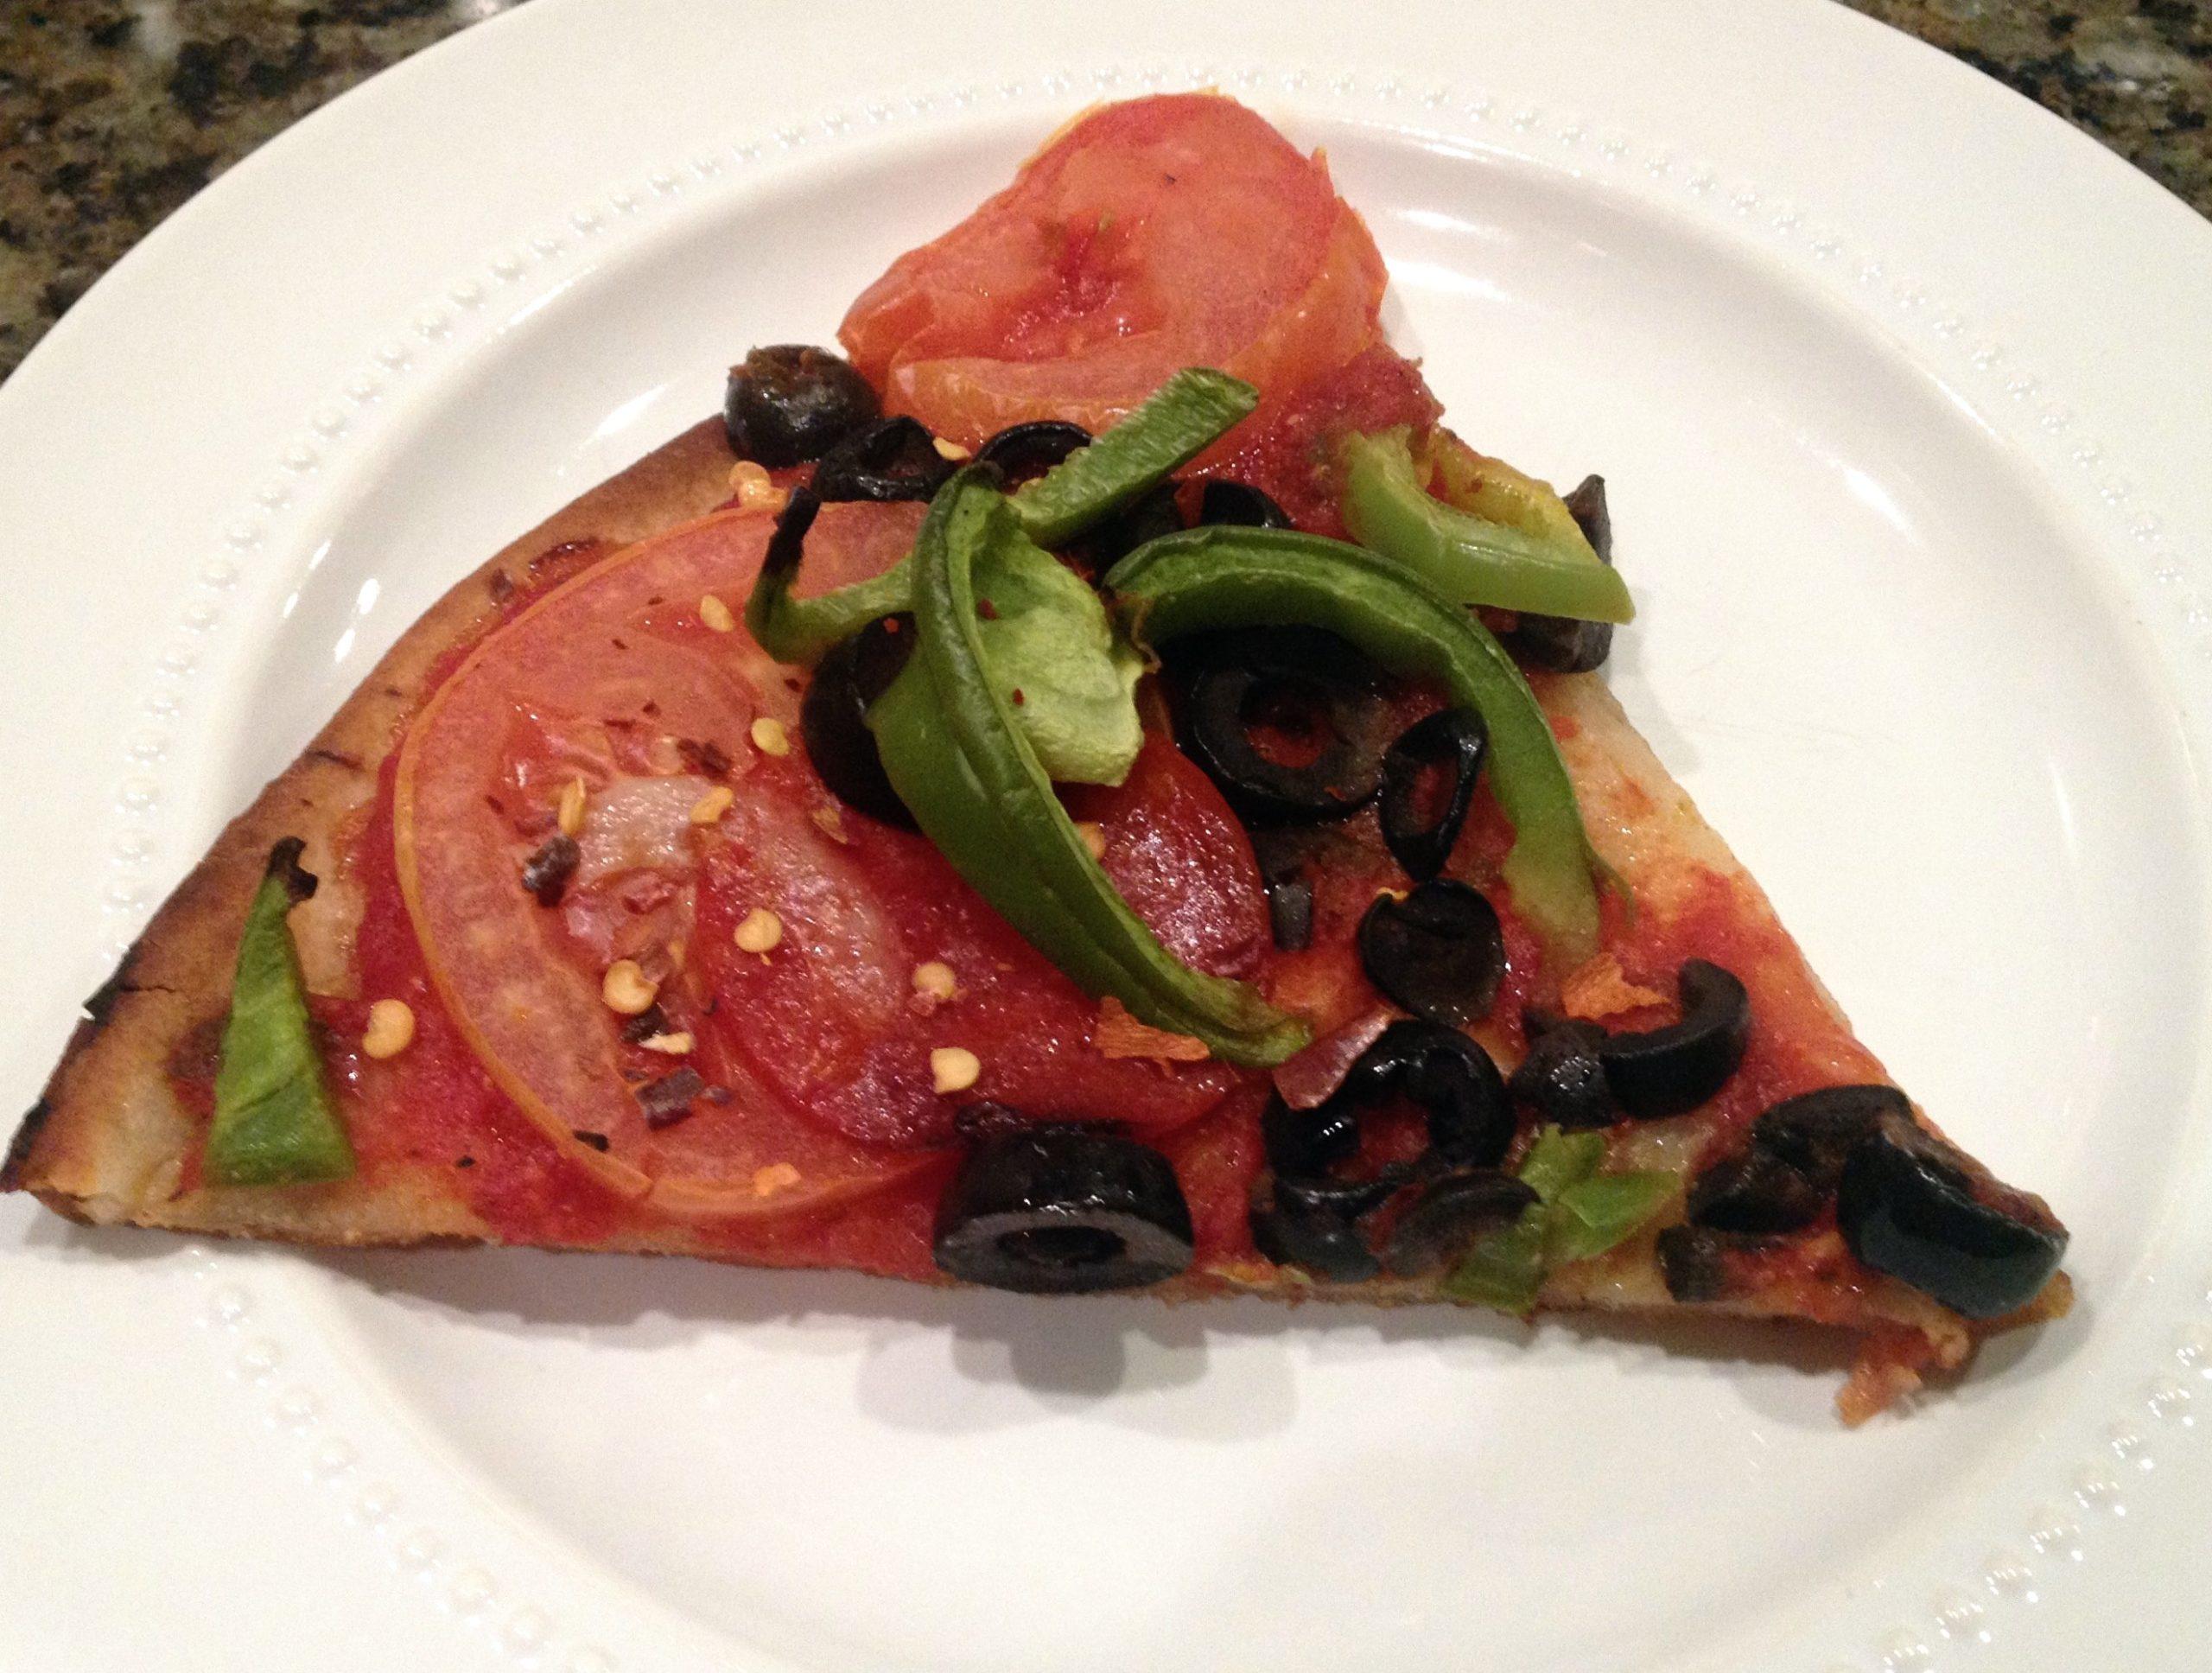 #PowellPack #Dayinthelife #GlutenFreePizza #HeidiPowell